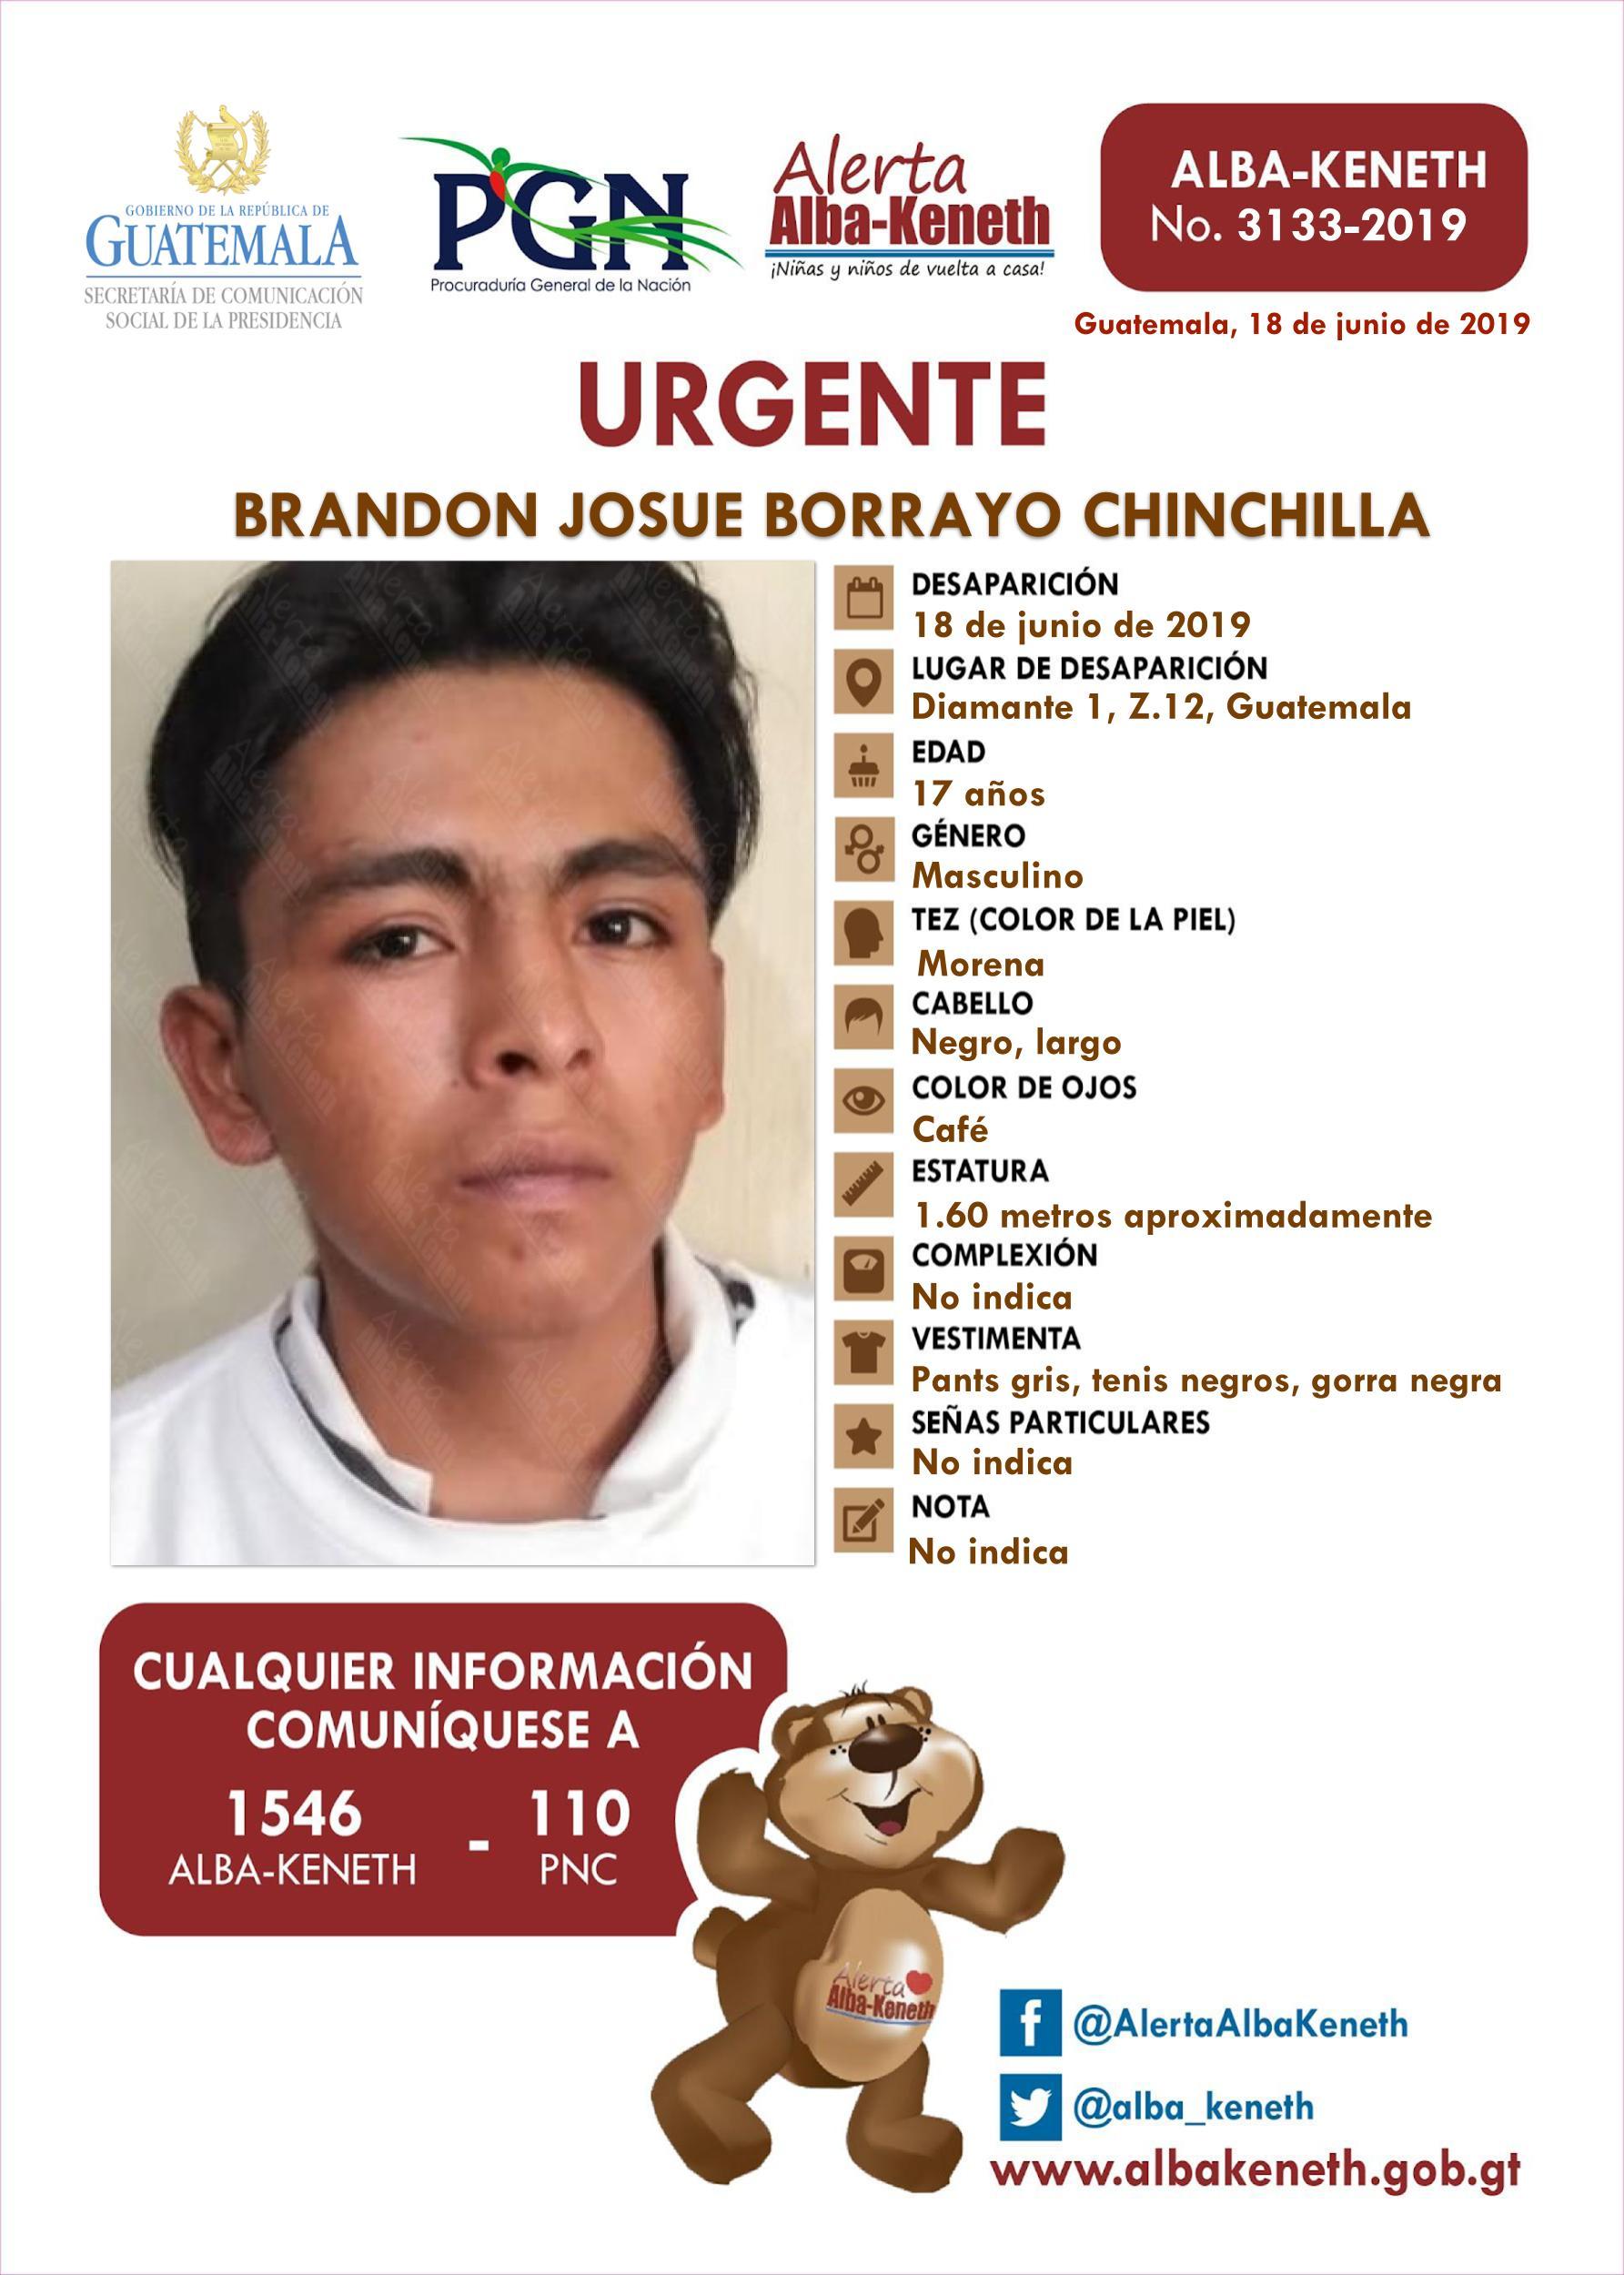 Brandon Josue Borrayo Chinchilla